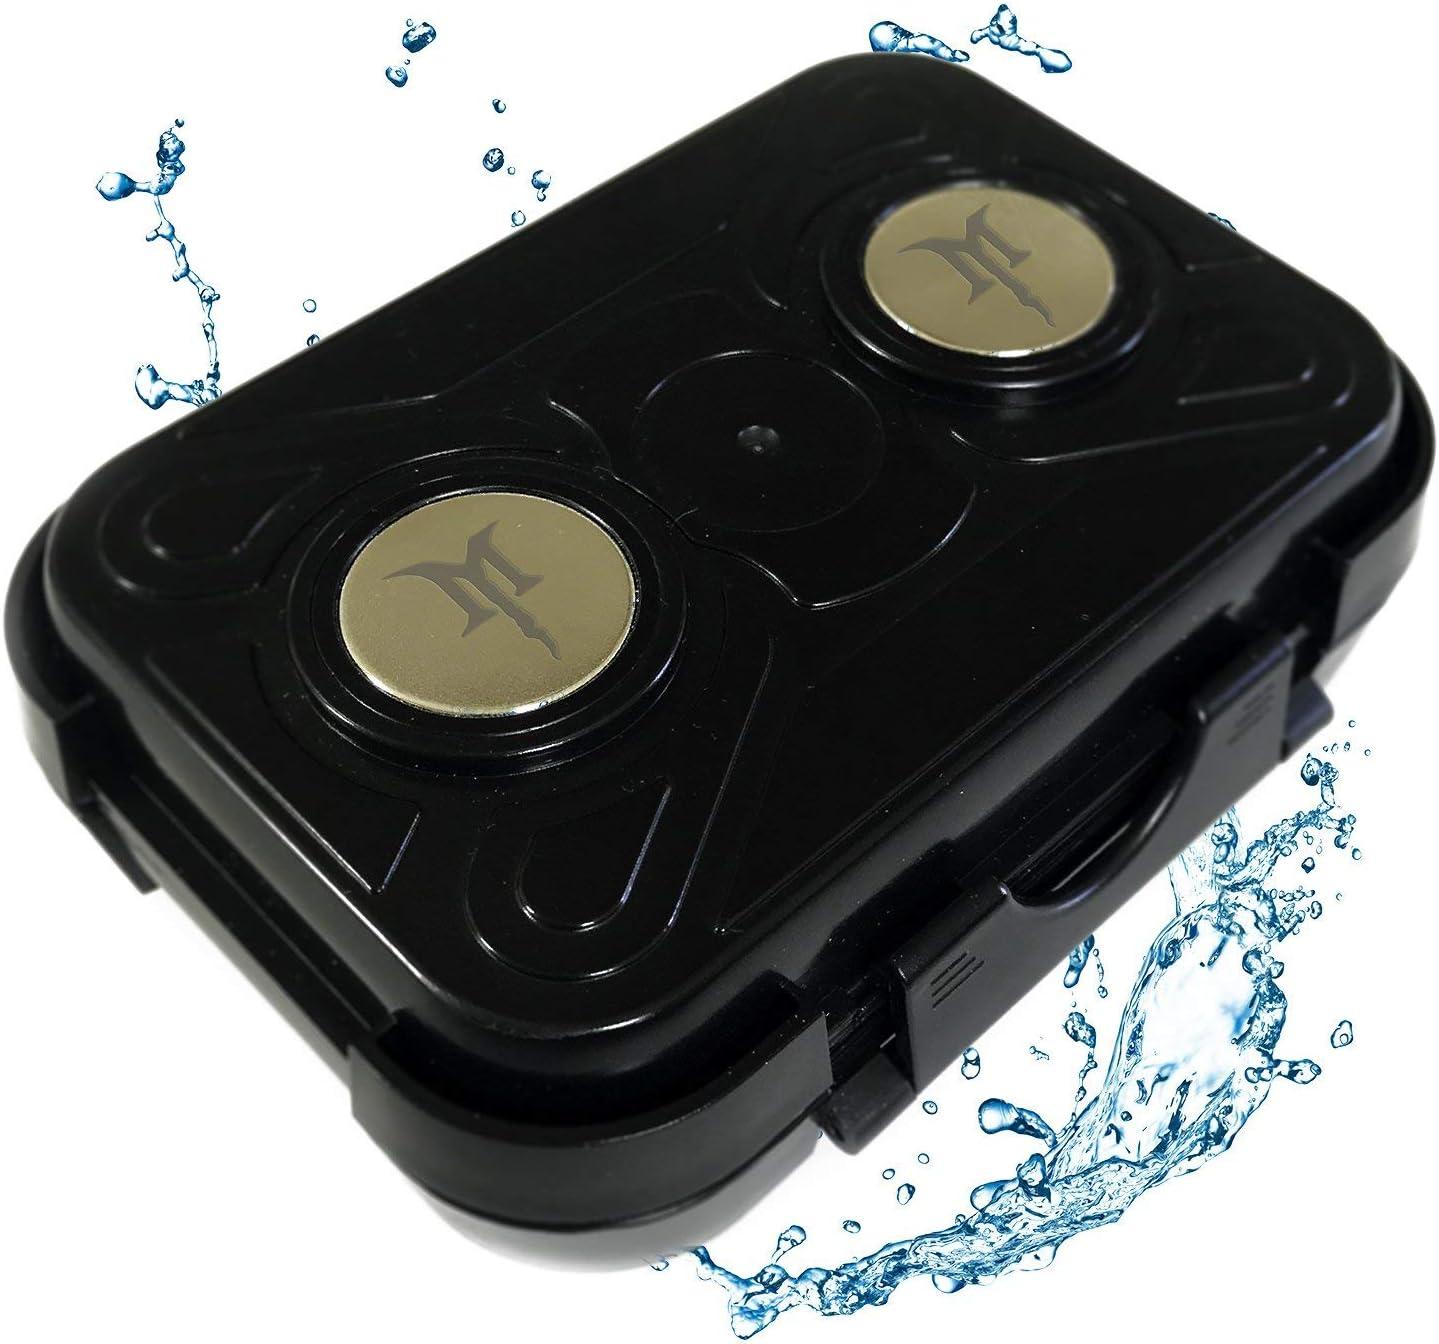 STASH BOX IndestructibleTruck Van Car Home Hidden Safe Security Case Magnetic